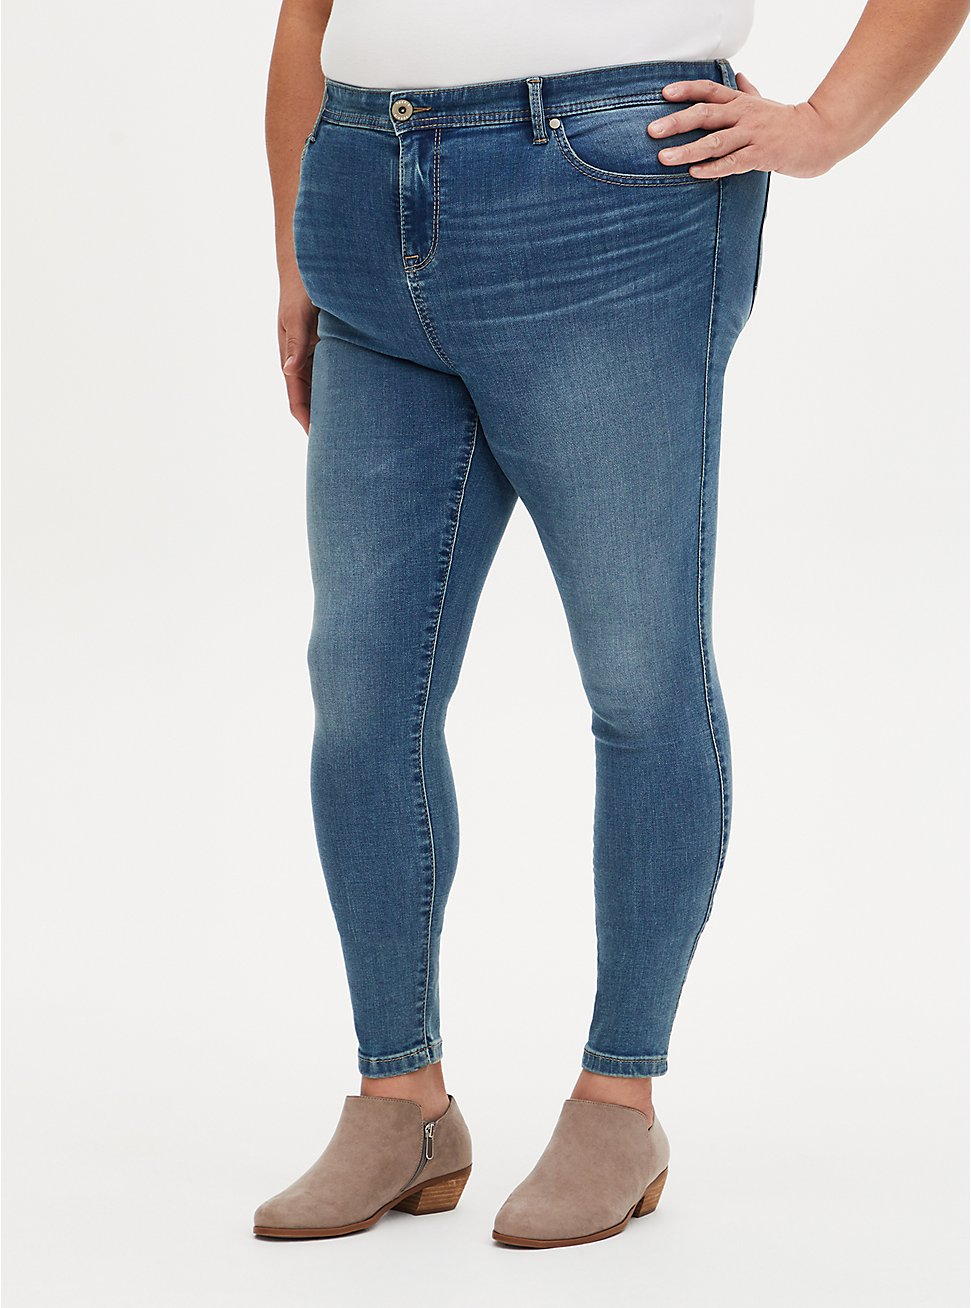 MidFit Super Skinny Jean - Super Soft Eco Medium Wash, SEAFLOOR, hi-res